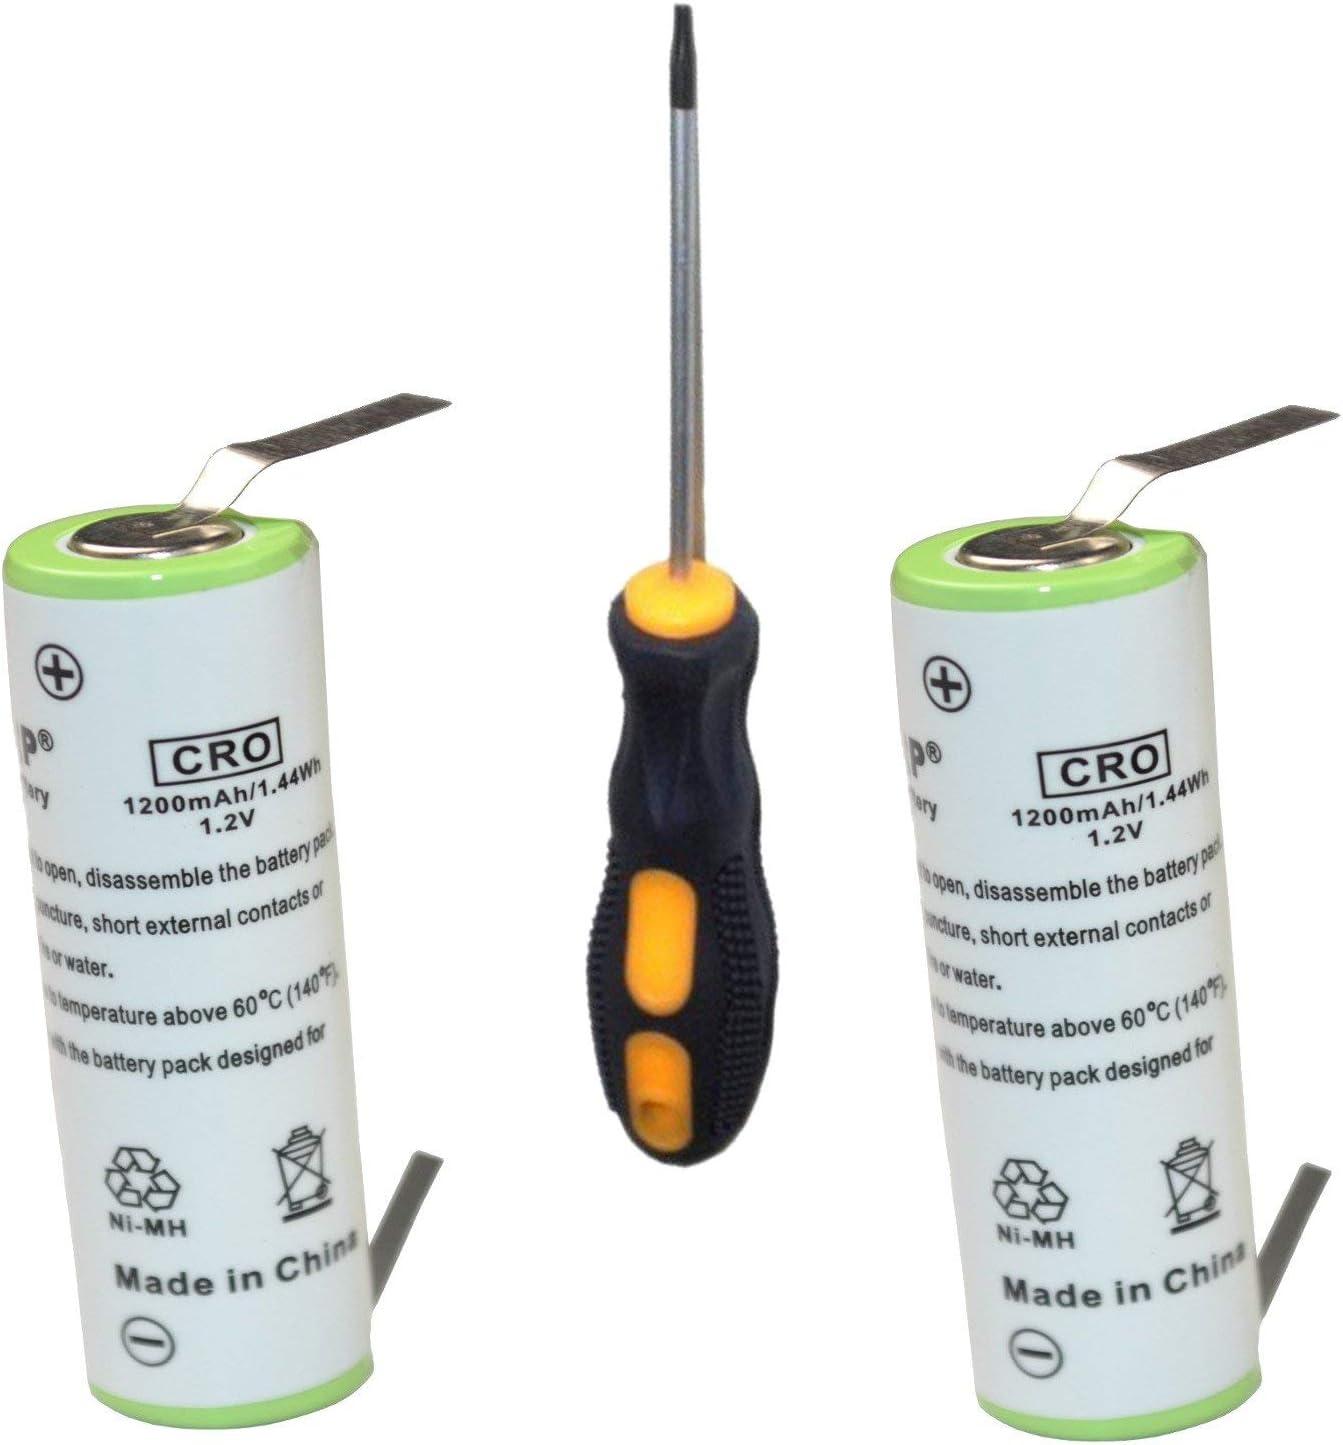 HQRP Paquete de 2 baterías Recargables Braun FreeGlider Modèle 6620 / Type 5708 / Modèle 6680/6690 Rasoir + HQRP Destornillador y Posavasos